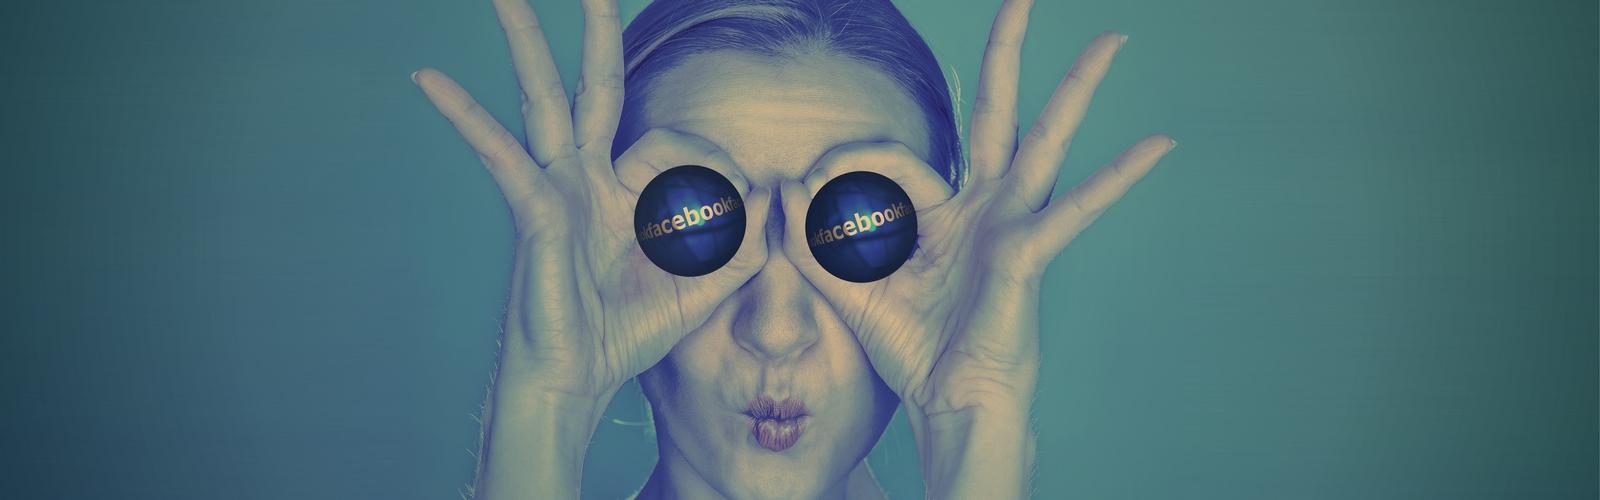 femme yeux facebook